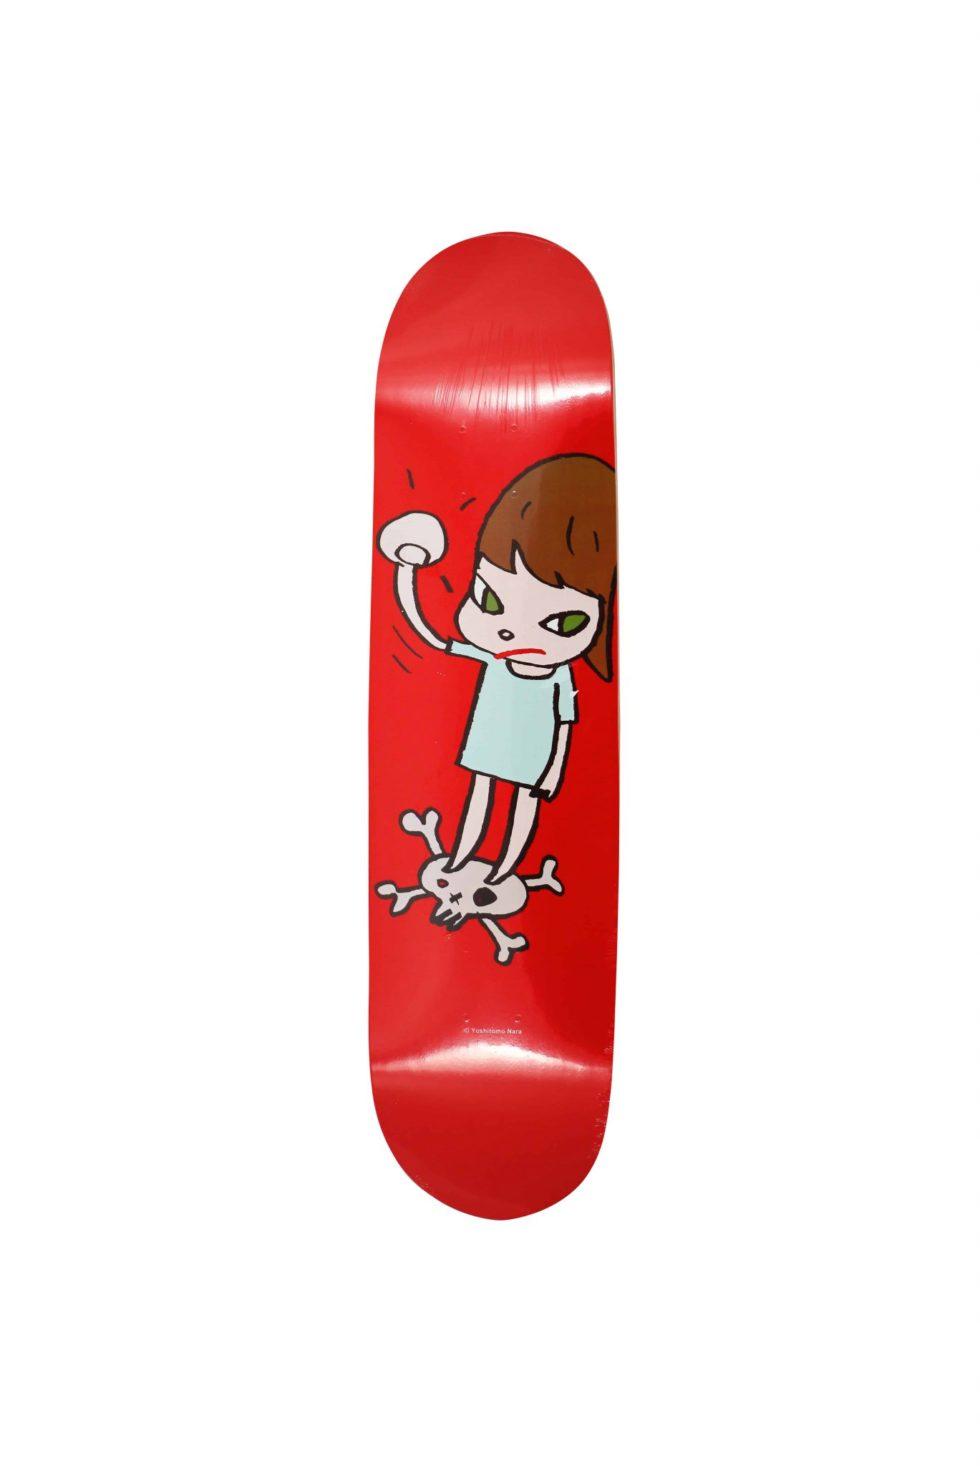 Lot #9833 – Yoshitomo Nara Solid Fist Skateboard Skate Deck Skateboard Decks Yoshitomo Nara